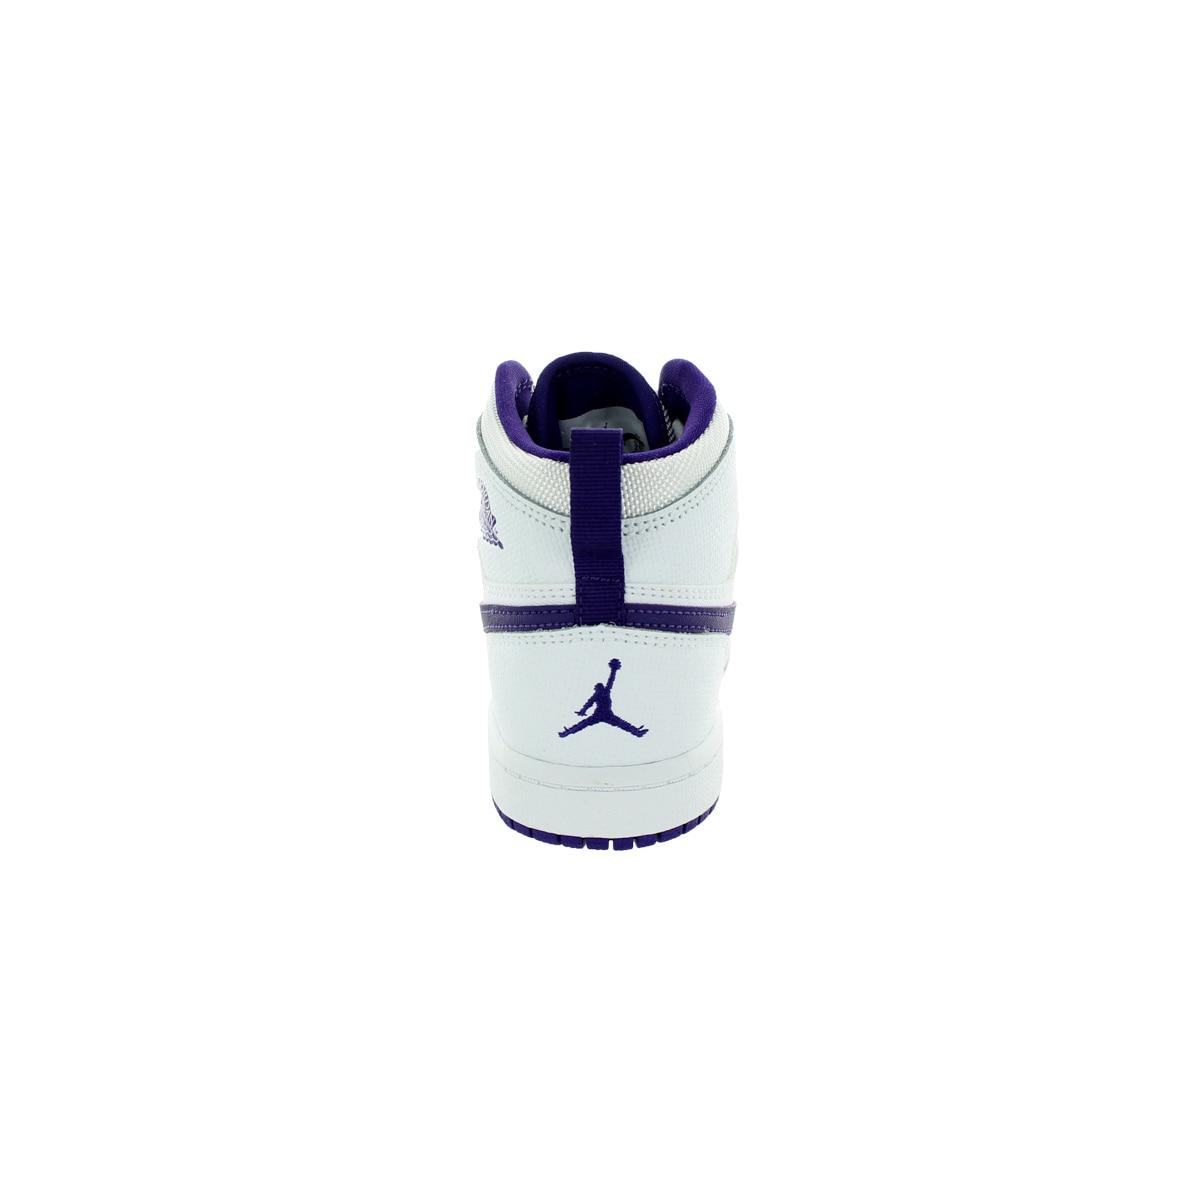 finest selection 939ce 8101f Shop Nike Jordan Kid s Jordan 1 Retro High Gp Whiteurplee White Basketball  Shoe - Free Shipping Today - Overstock.com - 12322166